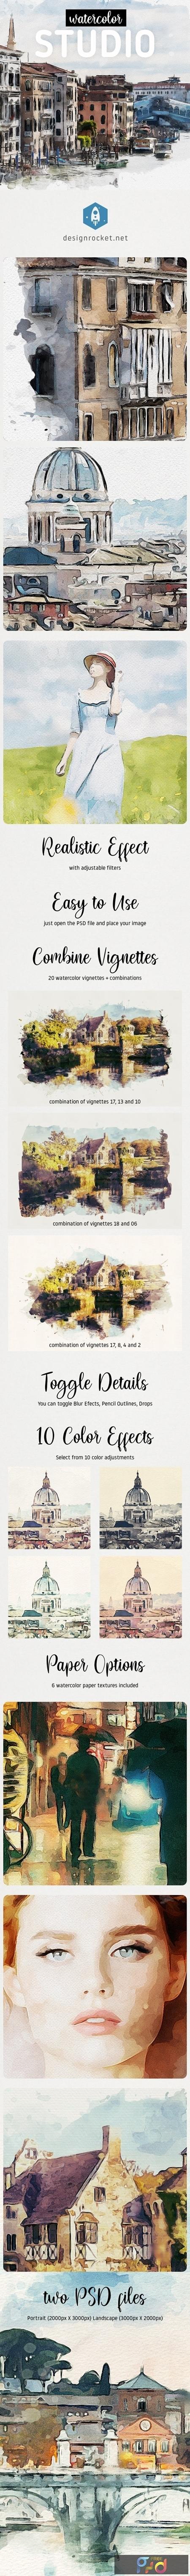 Watercolor Studio 25046502 1